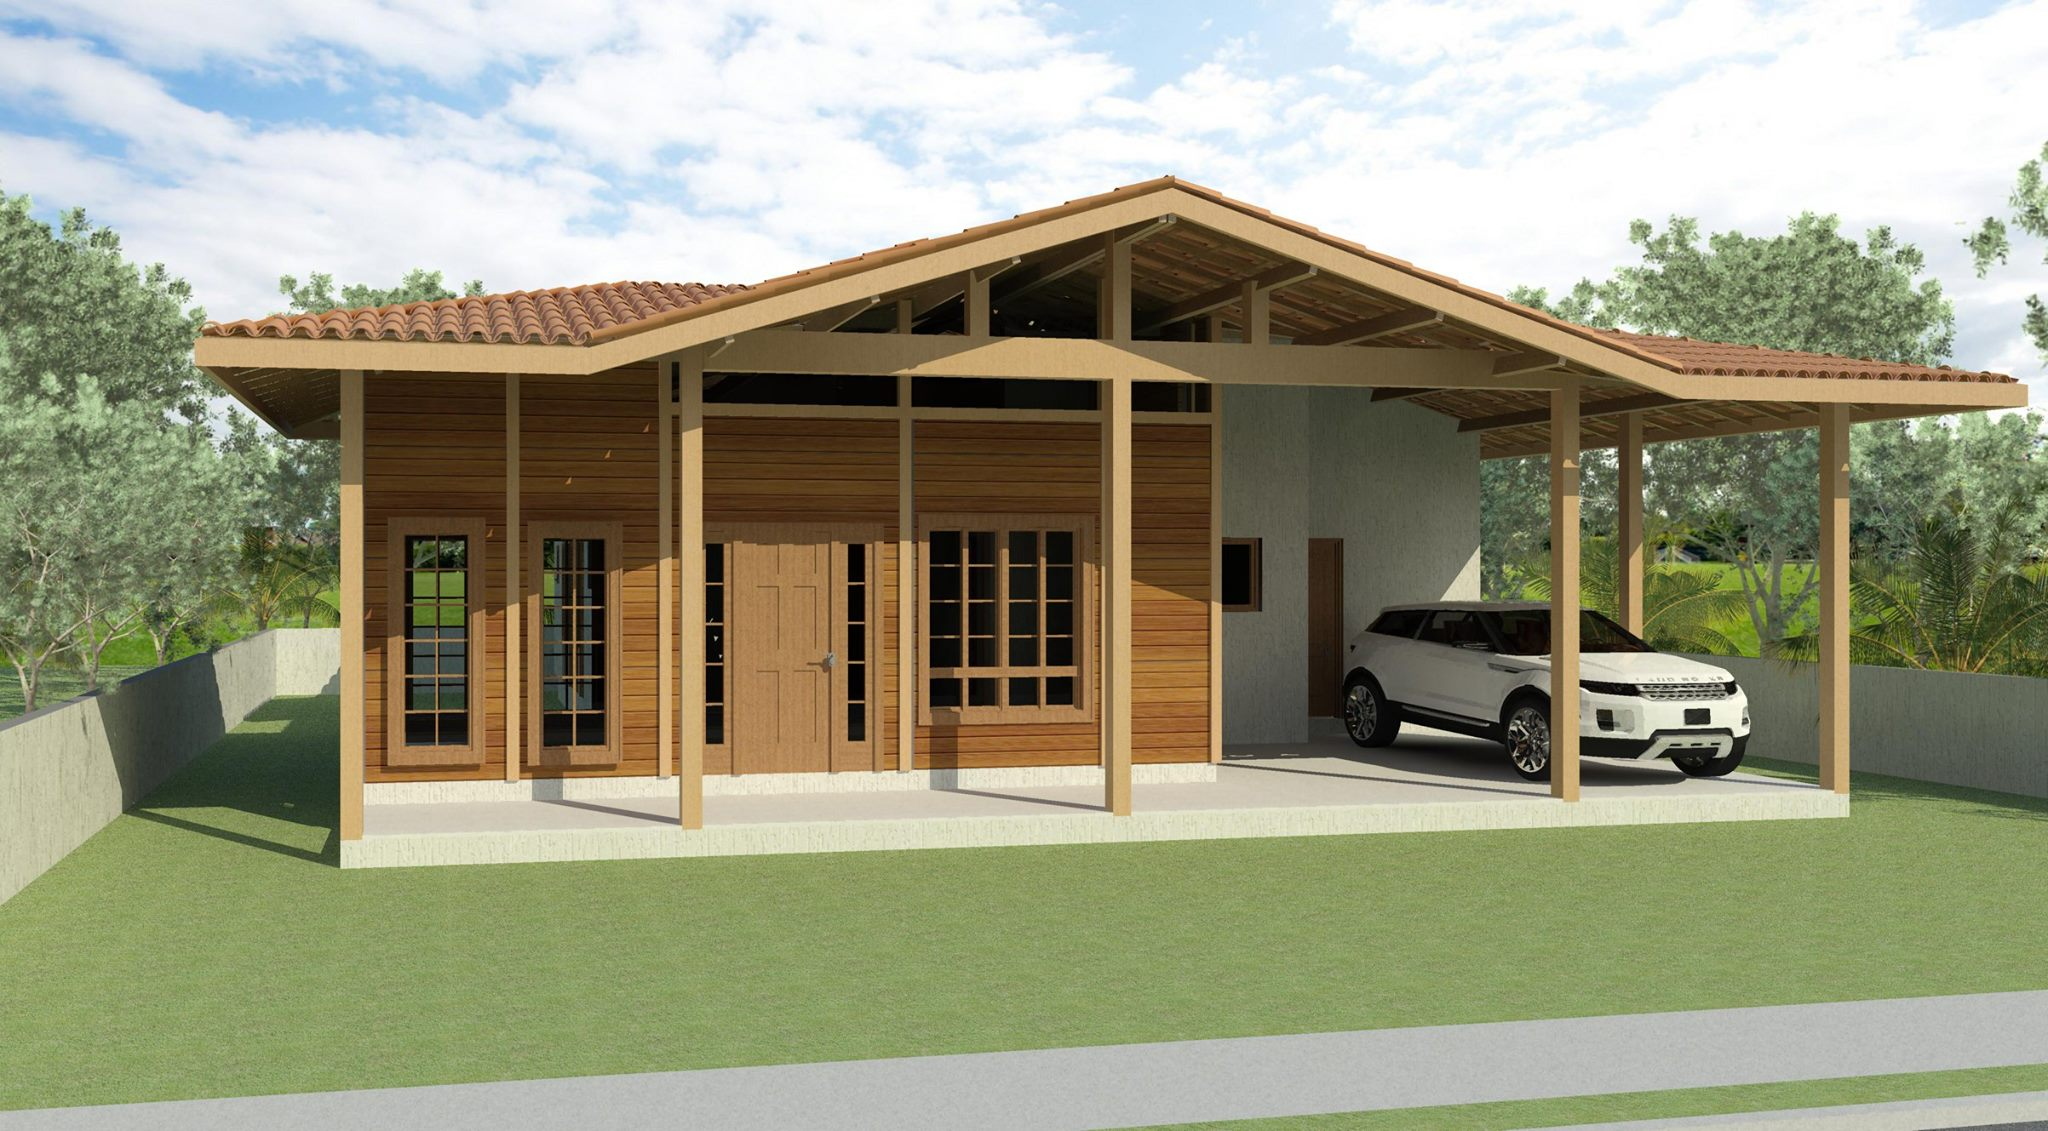 Casa de Madeira - Santa Leopoldina-ES - 135,00 m² - Pré Casas